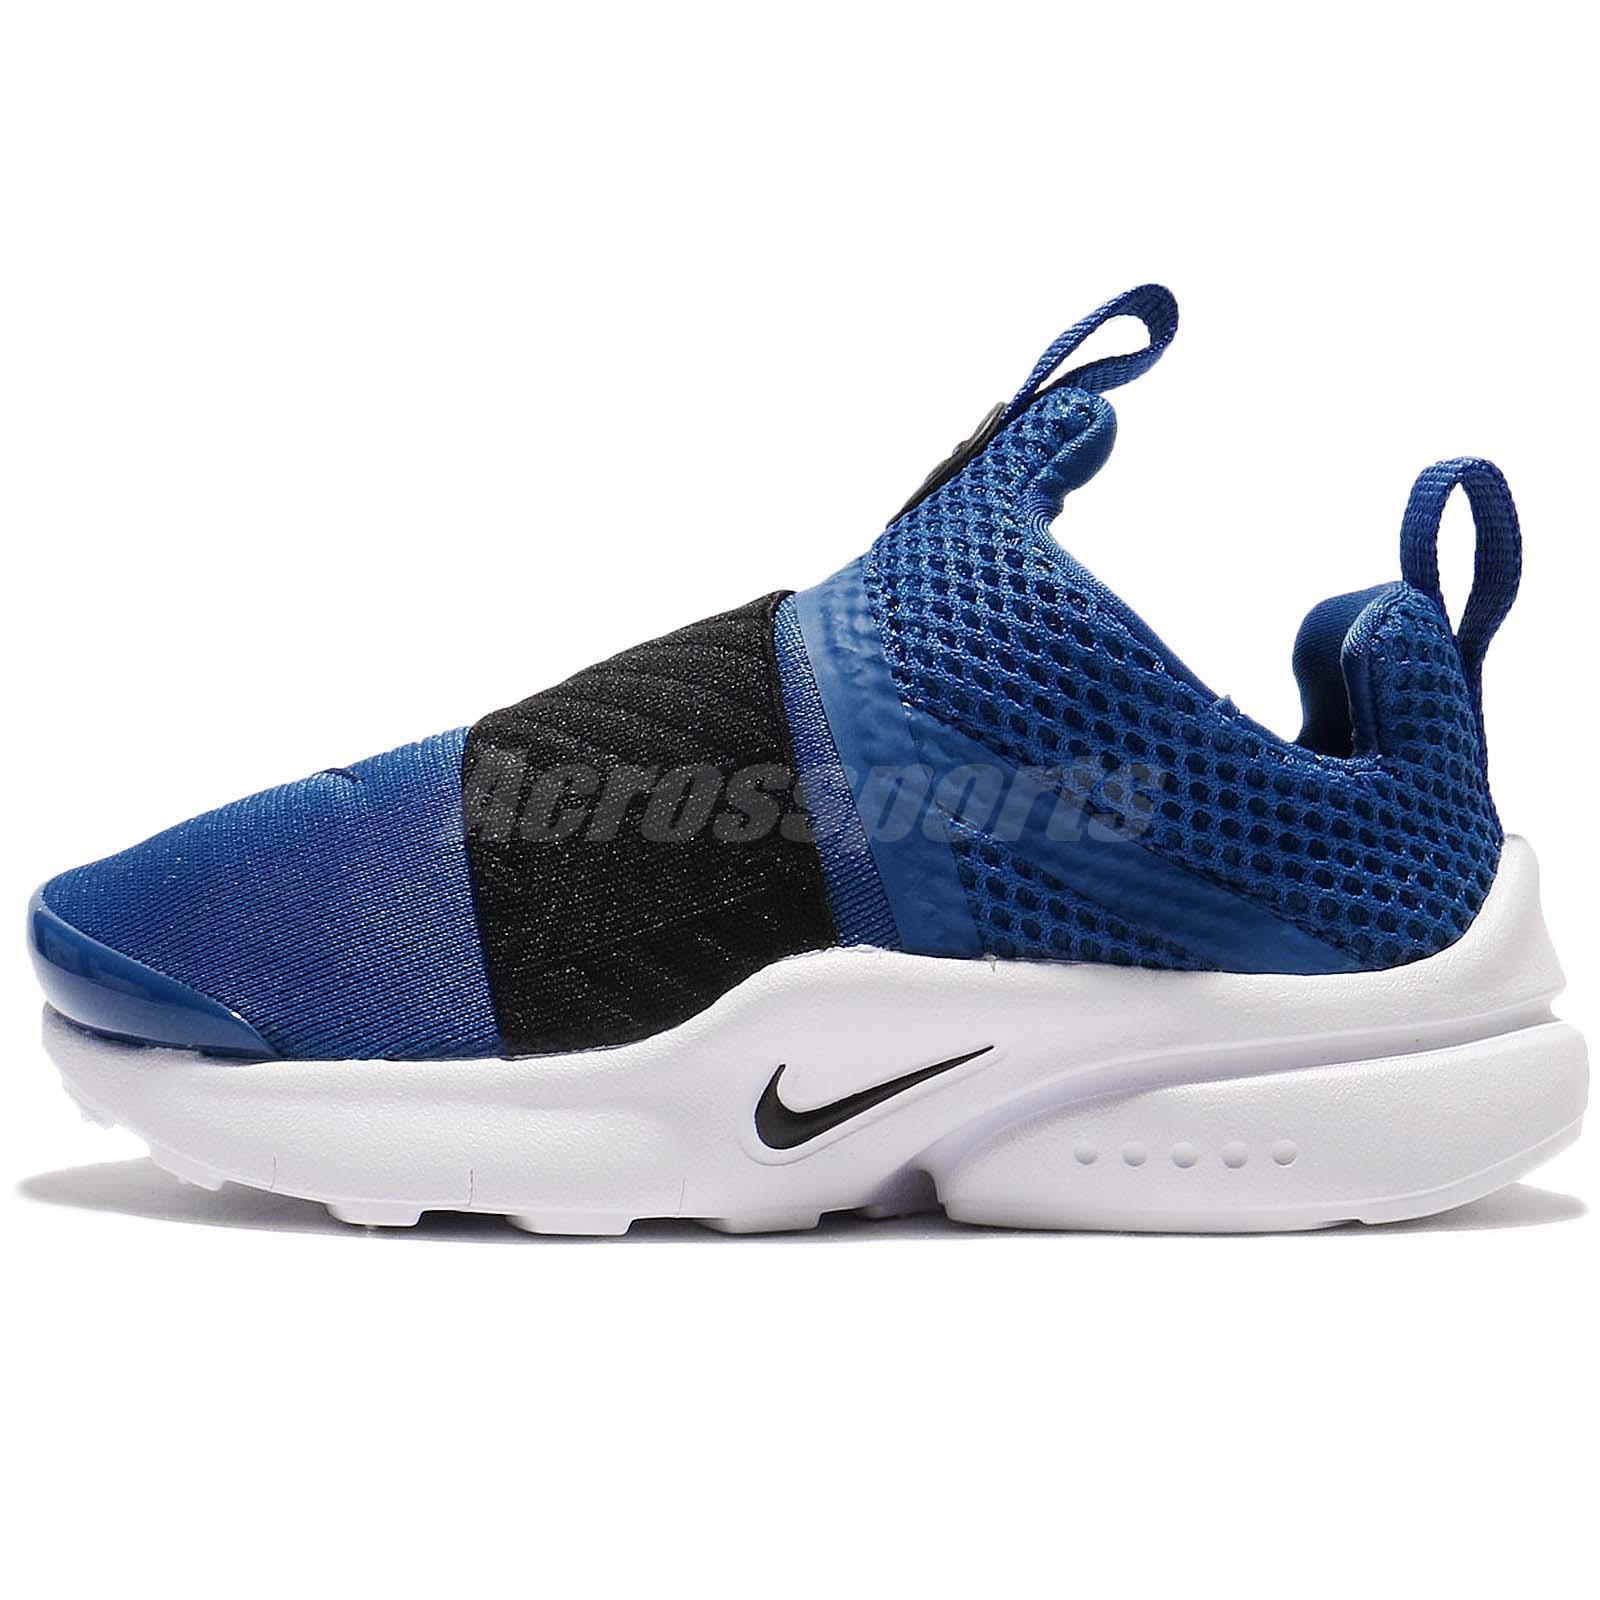 ... nike presto extreme td blue black toddler baby infant running shoes  870019 402